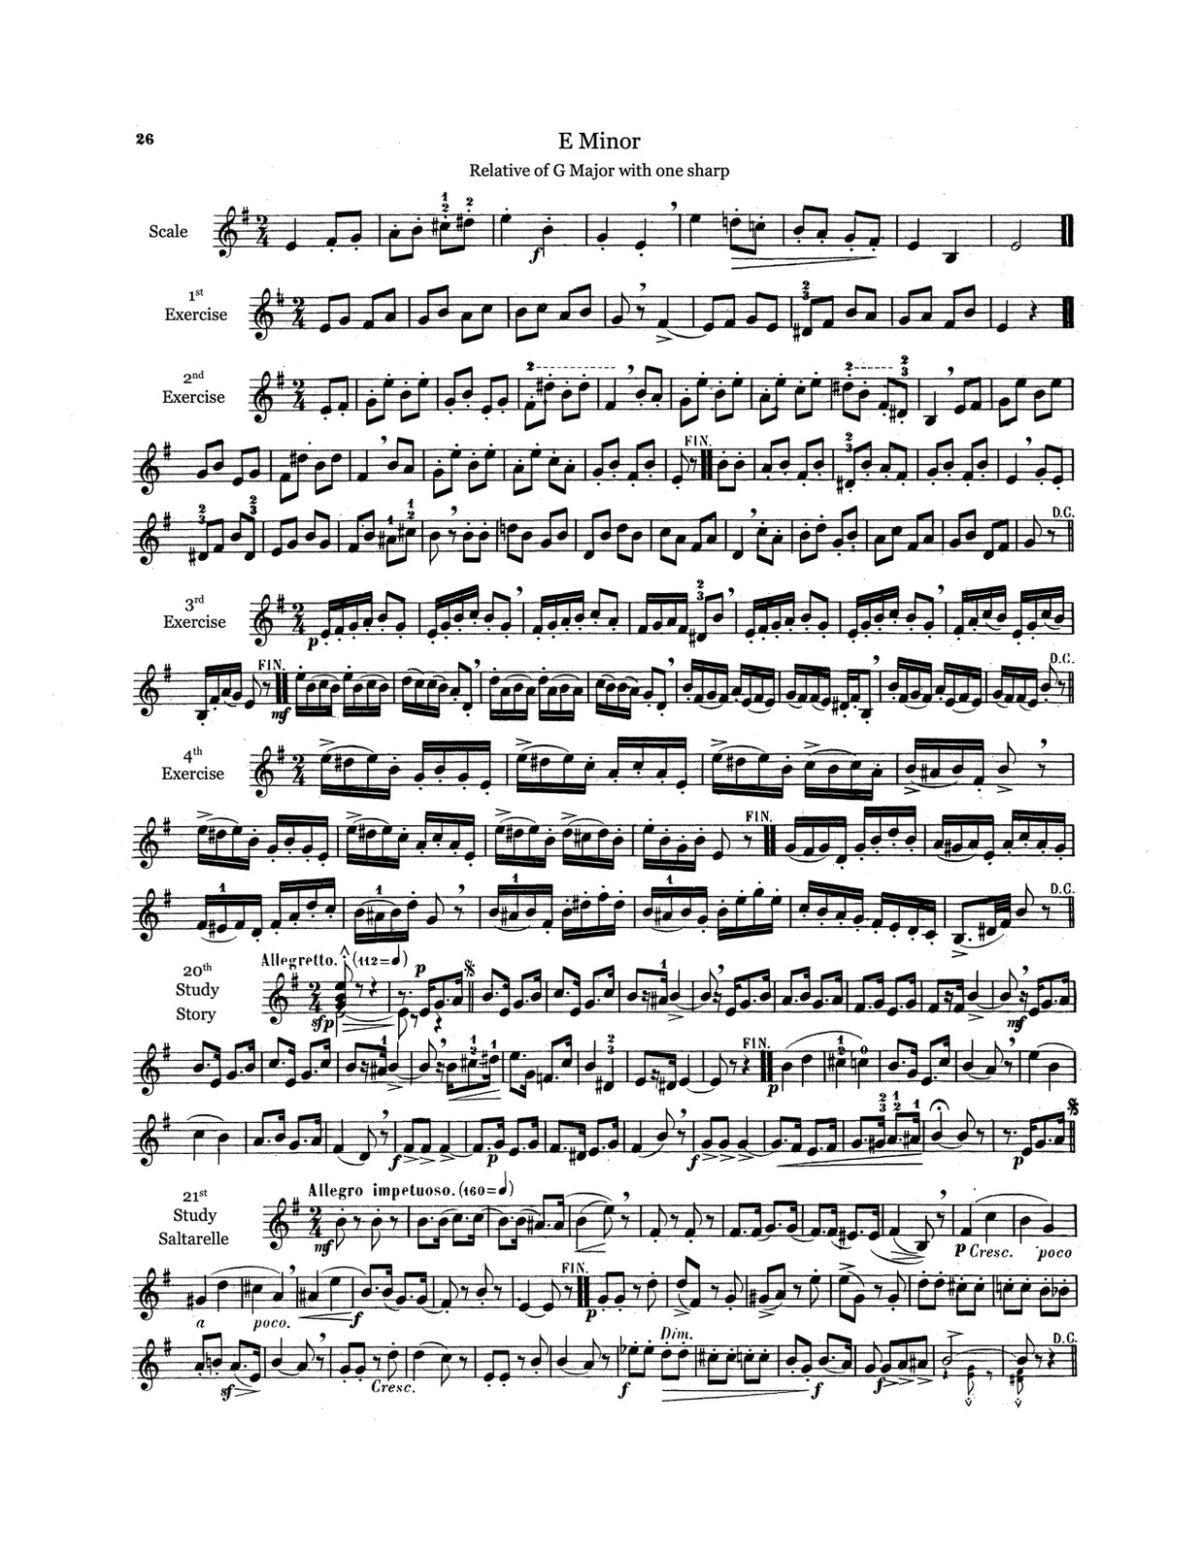 Clodomir, Complete Method for Trumpet or Cornet-p028